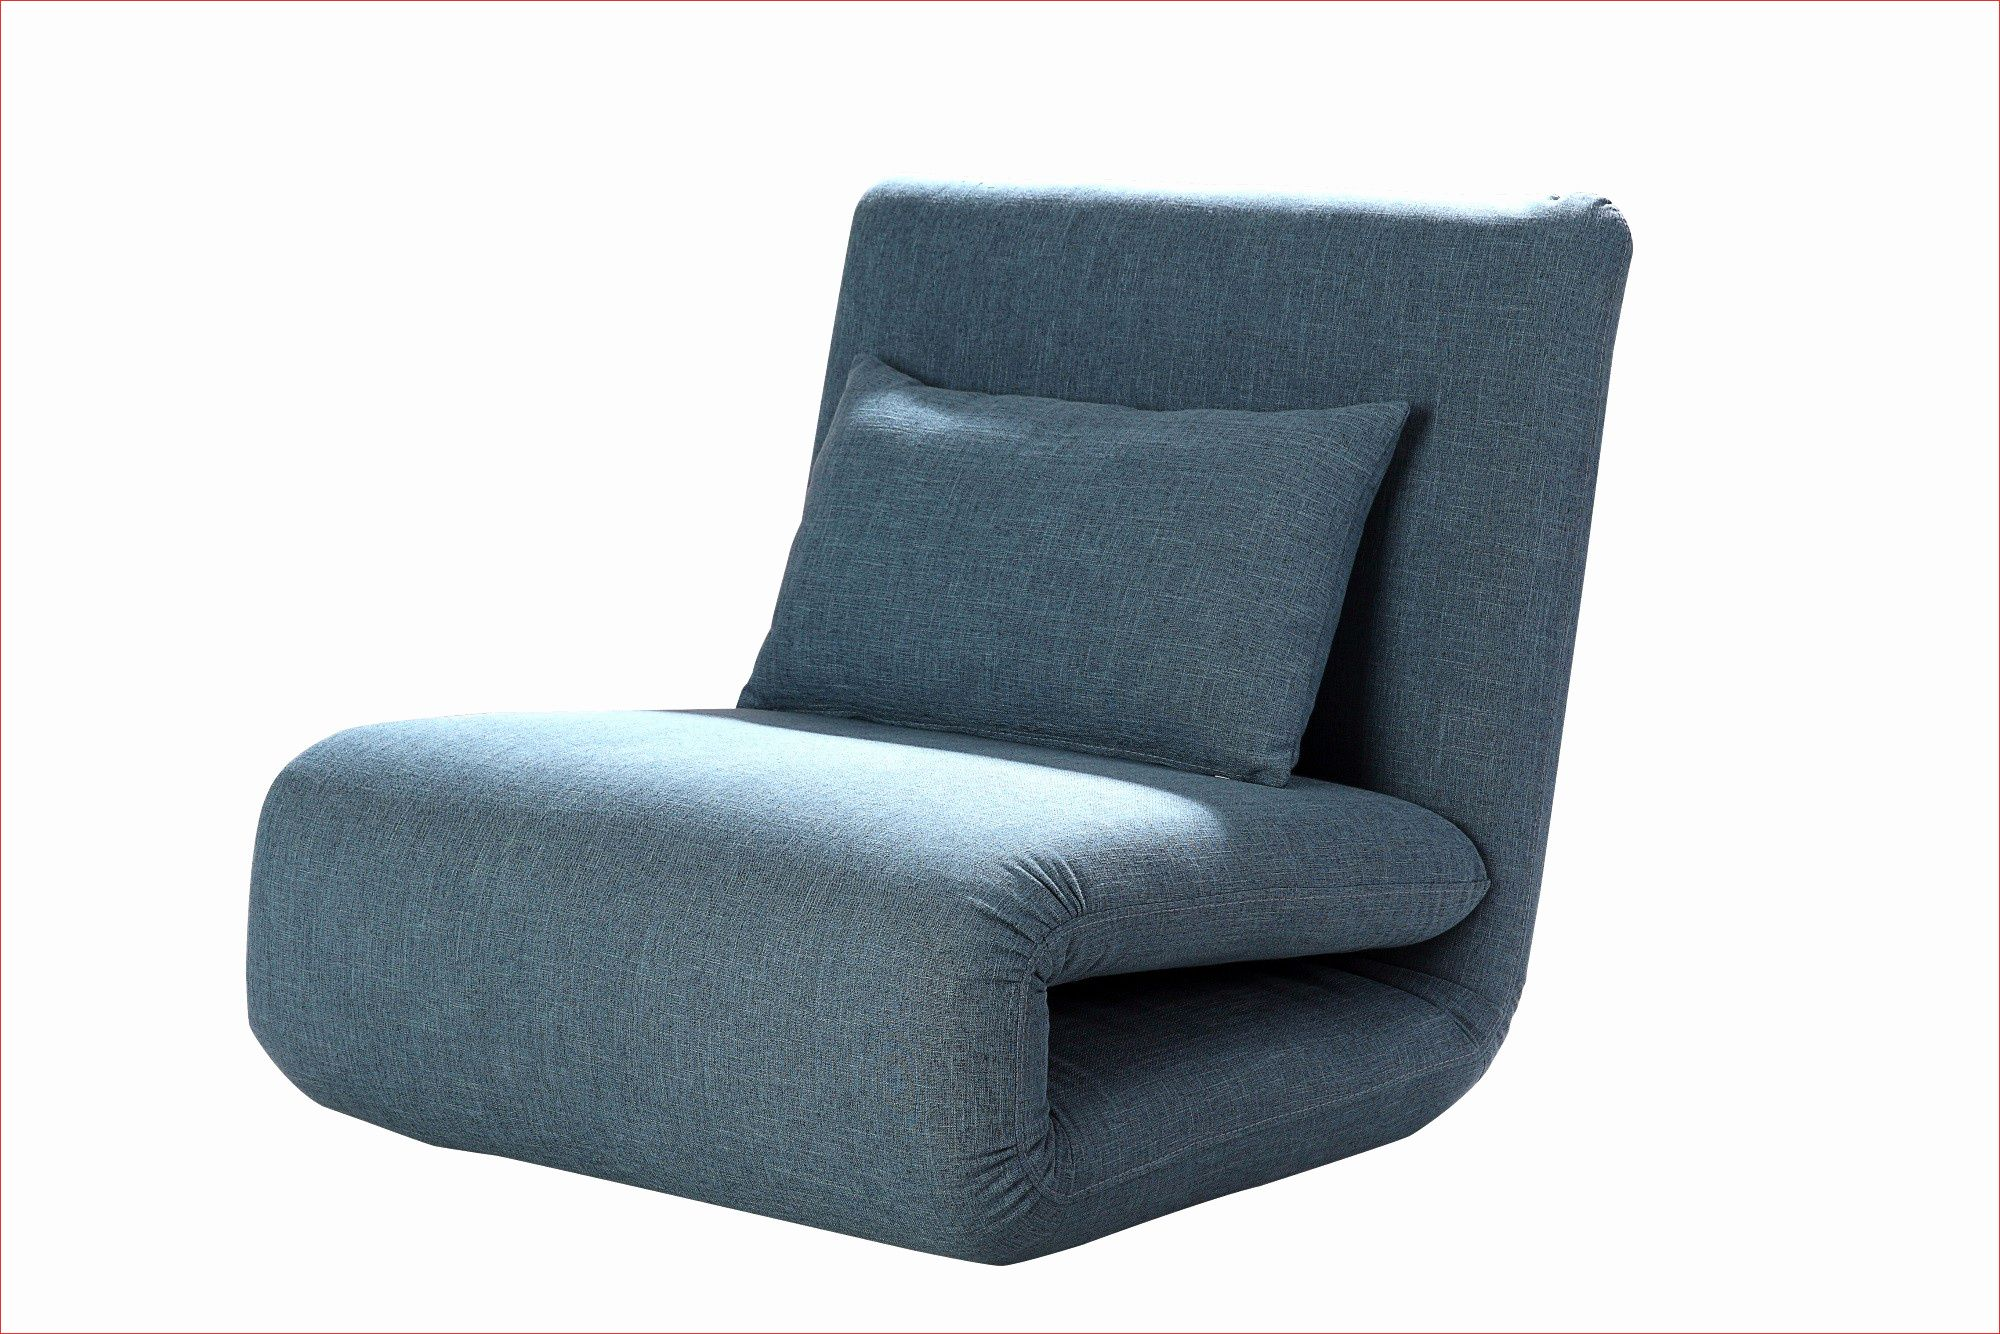 15 Incroyable Fauteuil Confortable Ikea Gallery En 2020 Fauteuil